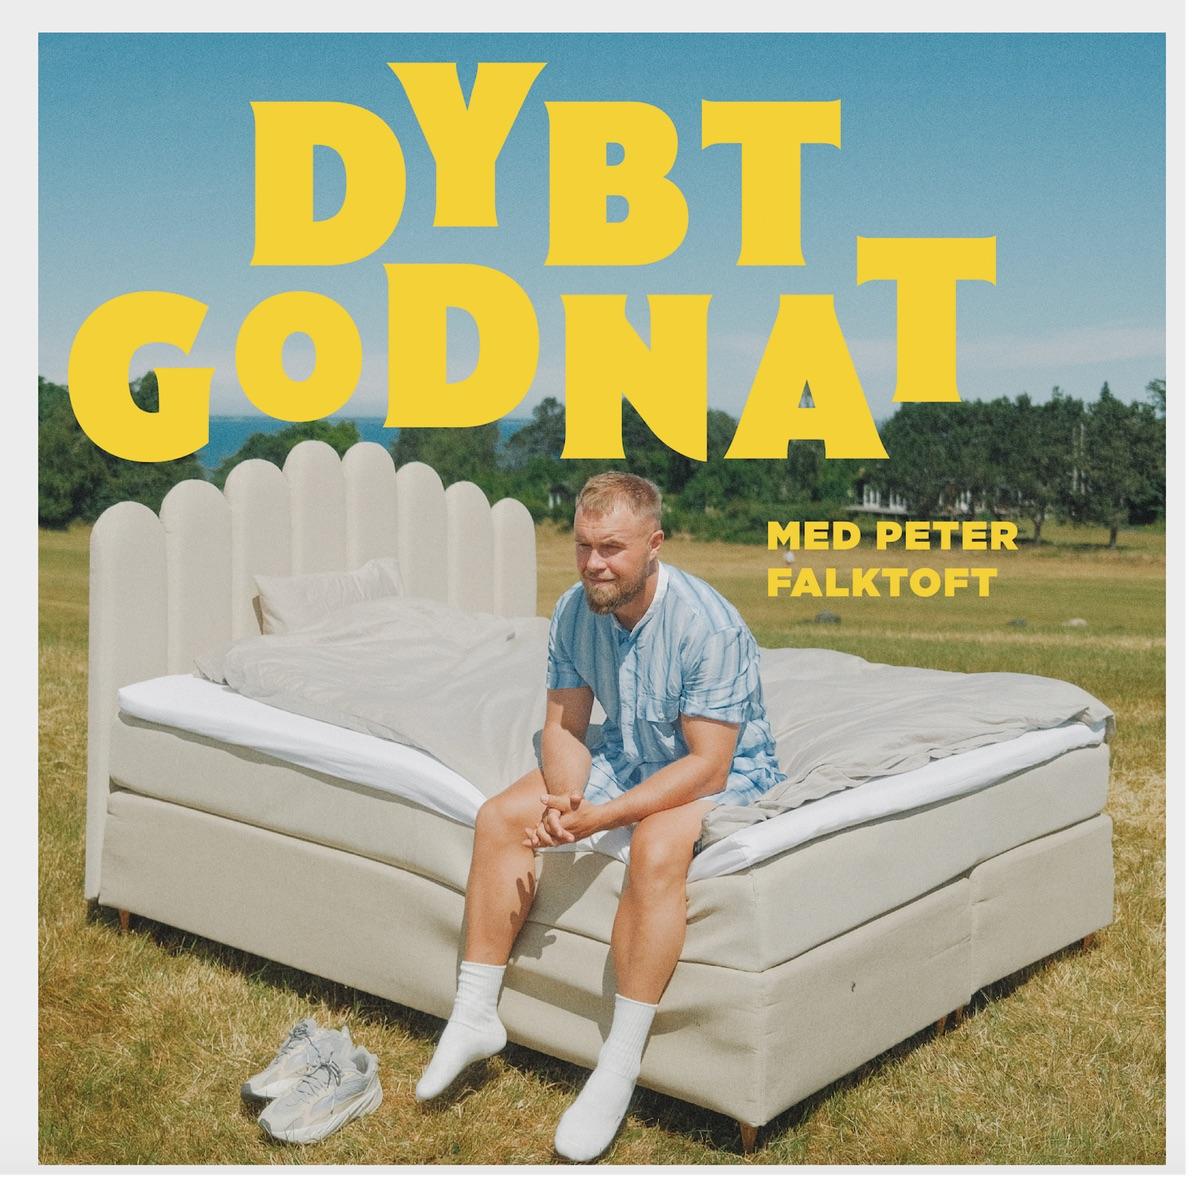 Dybt Godnat med Peter Falktoft